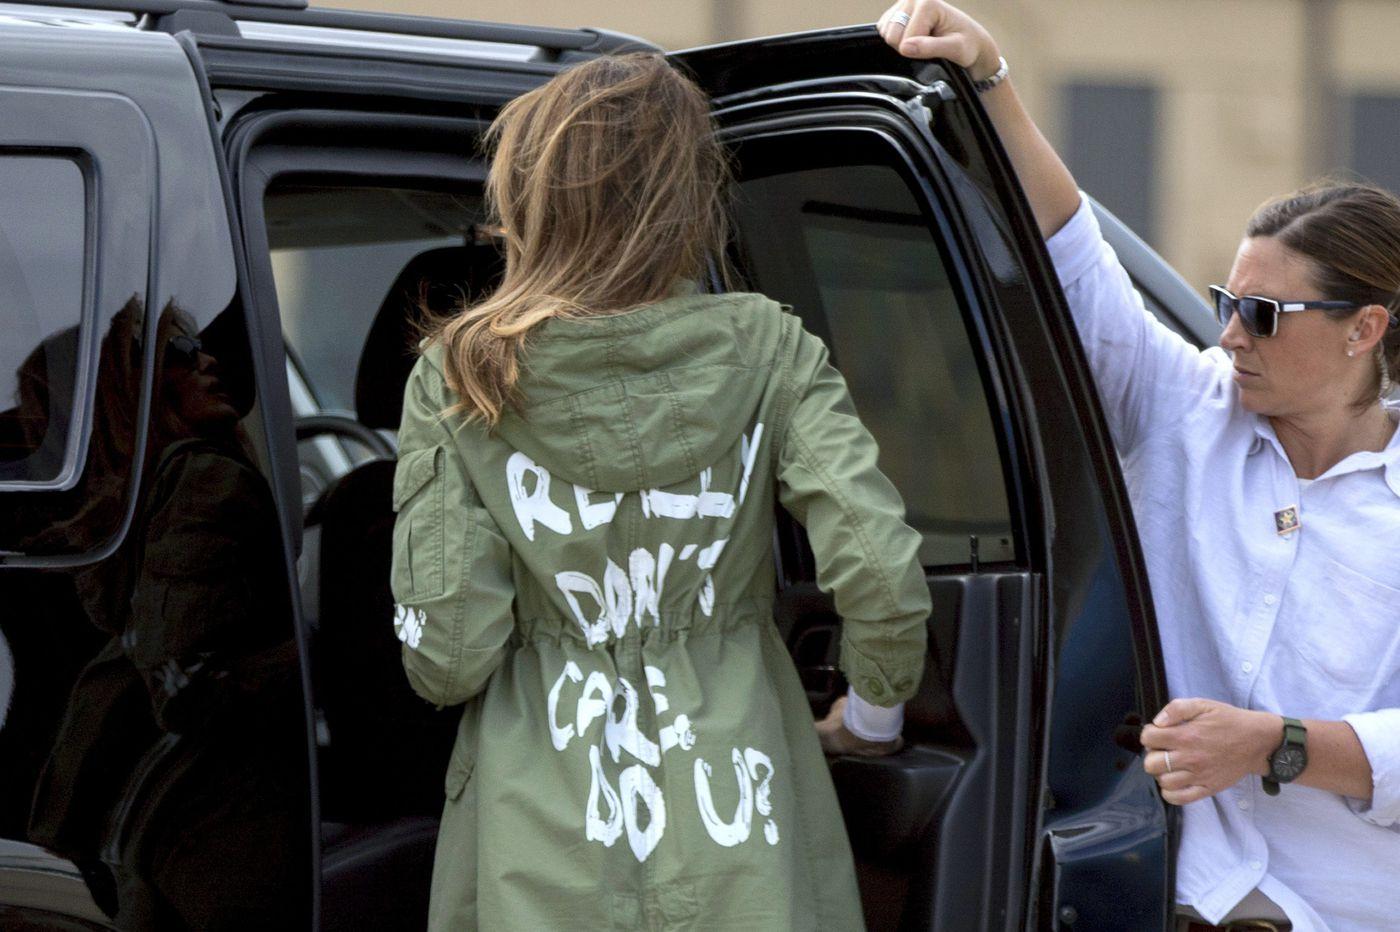 Melania Trump's jacket: Does she really think we don't see the symbolism? | Elizabeth Wellington